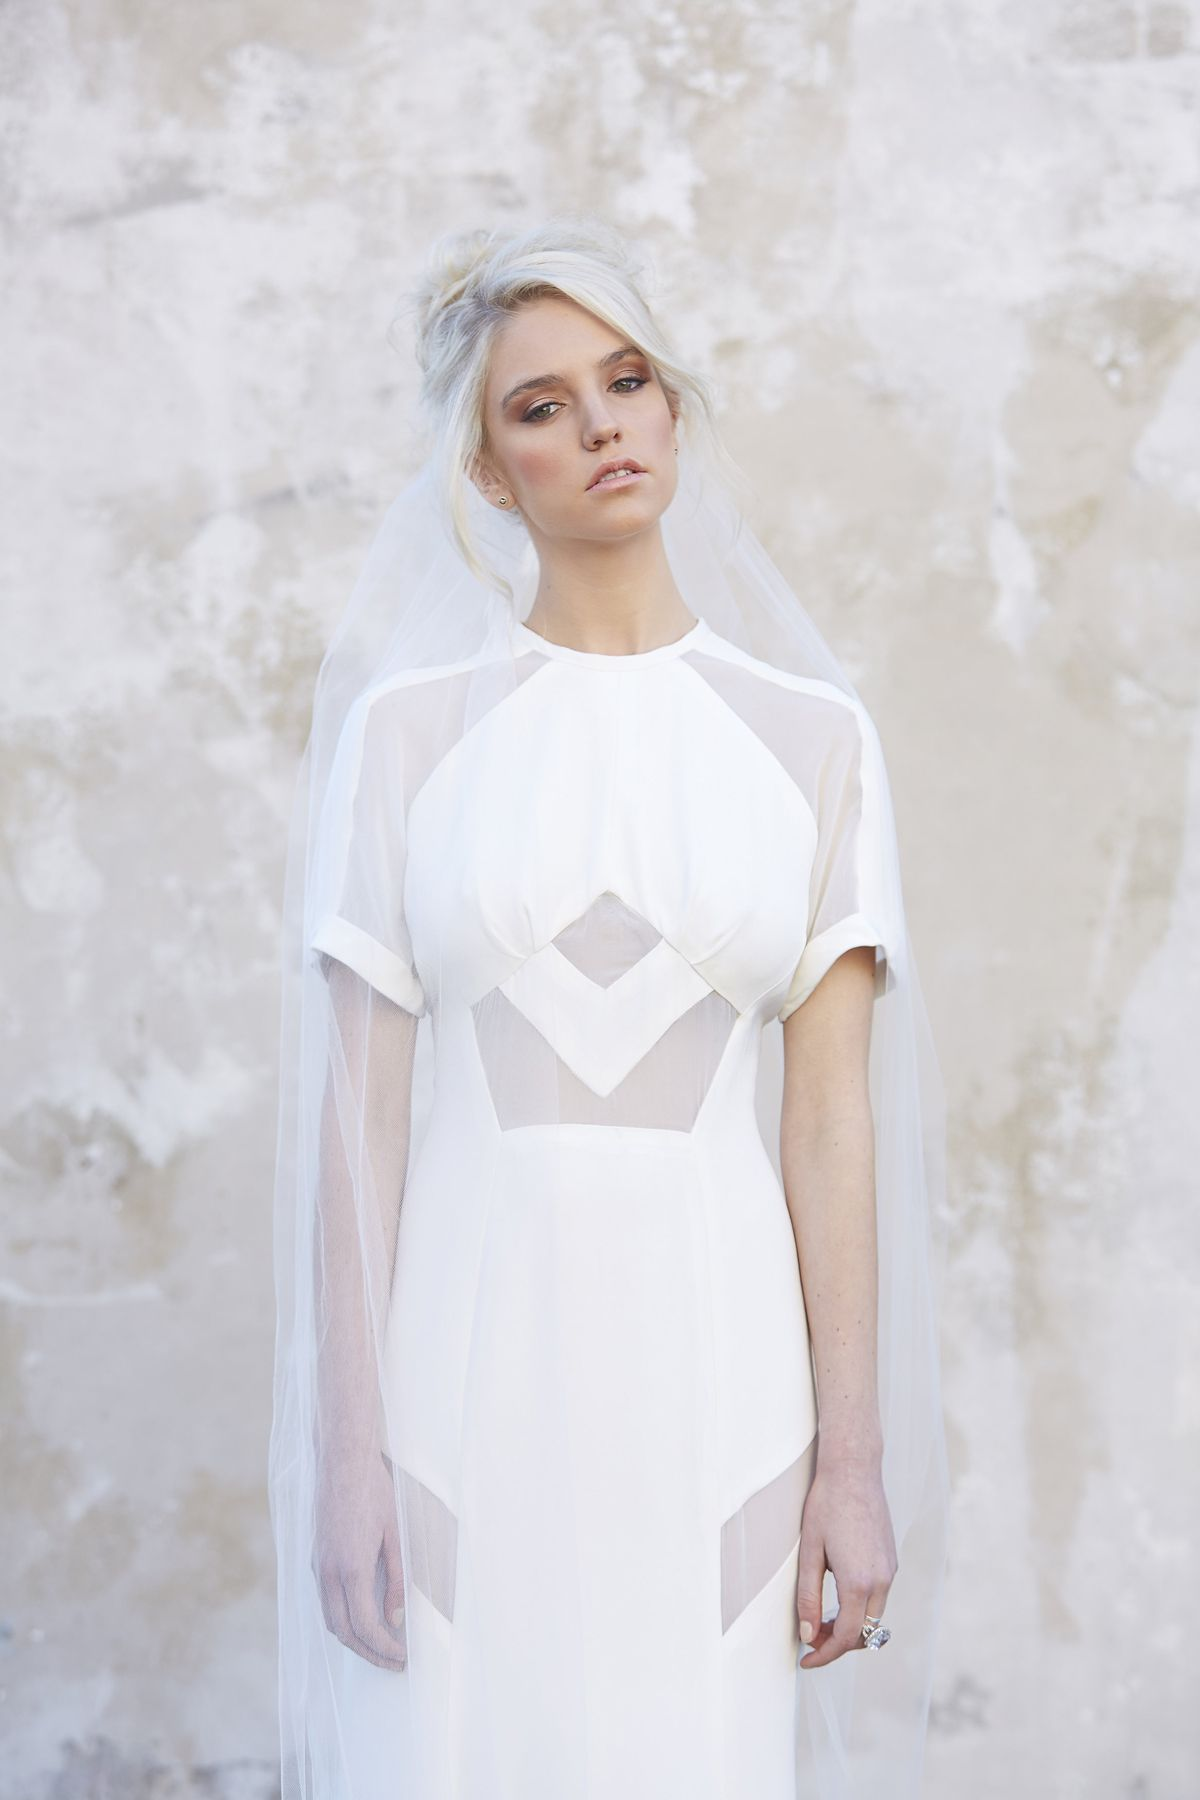 Geometric wedding dress by georgia young couture melbourne geometric wedding dress by georgia young couture melbourne bridal designer ombrellifo Choice Image